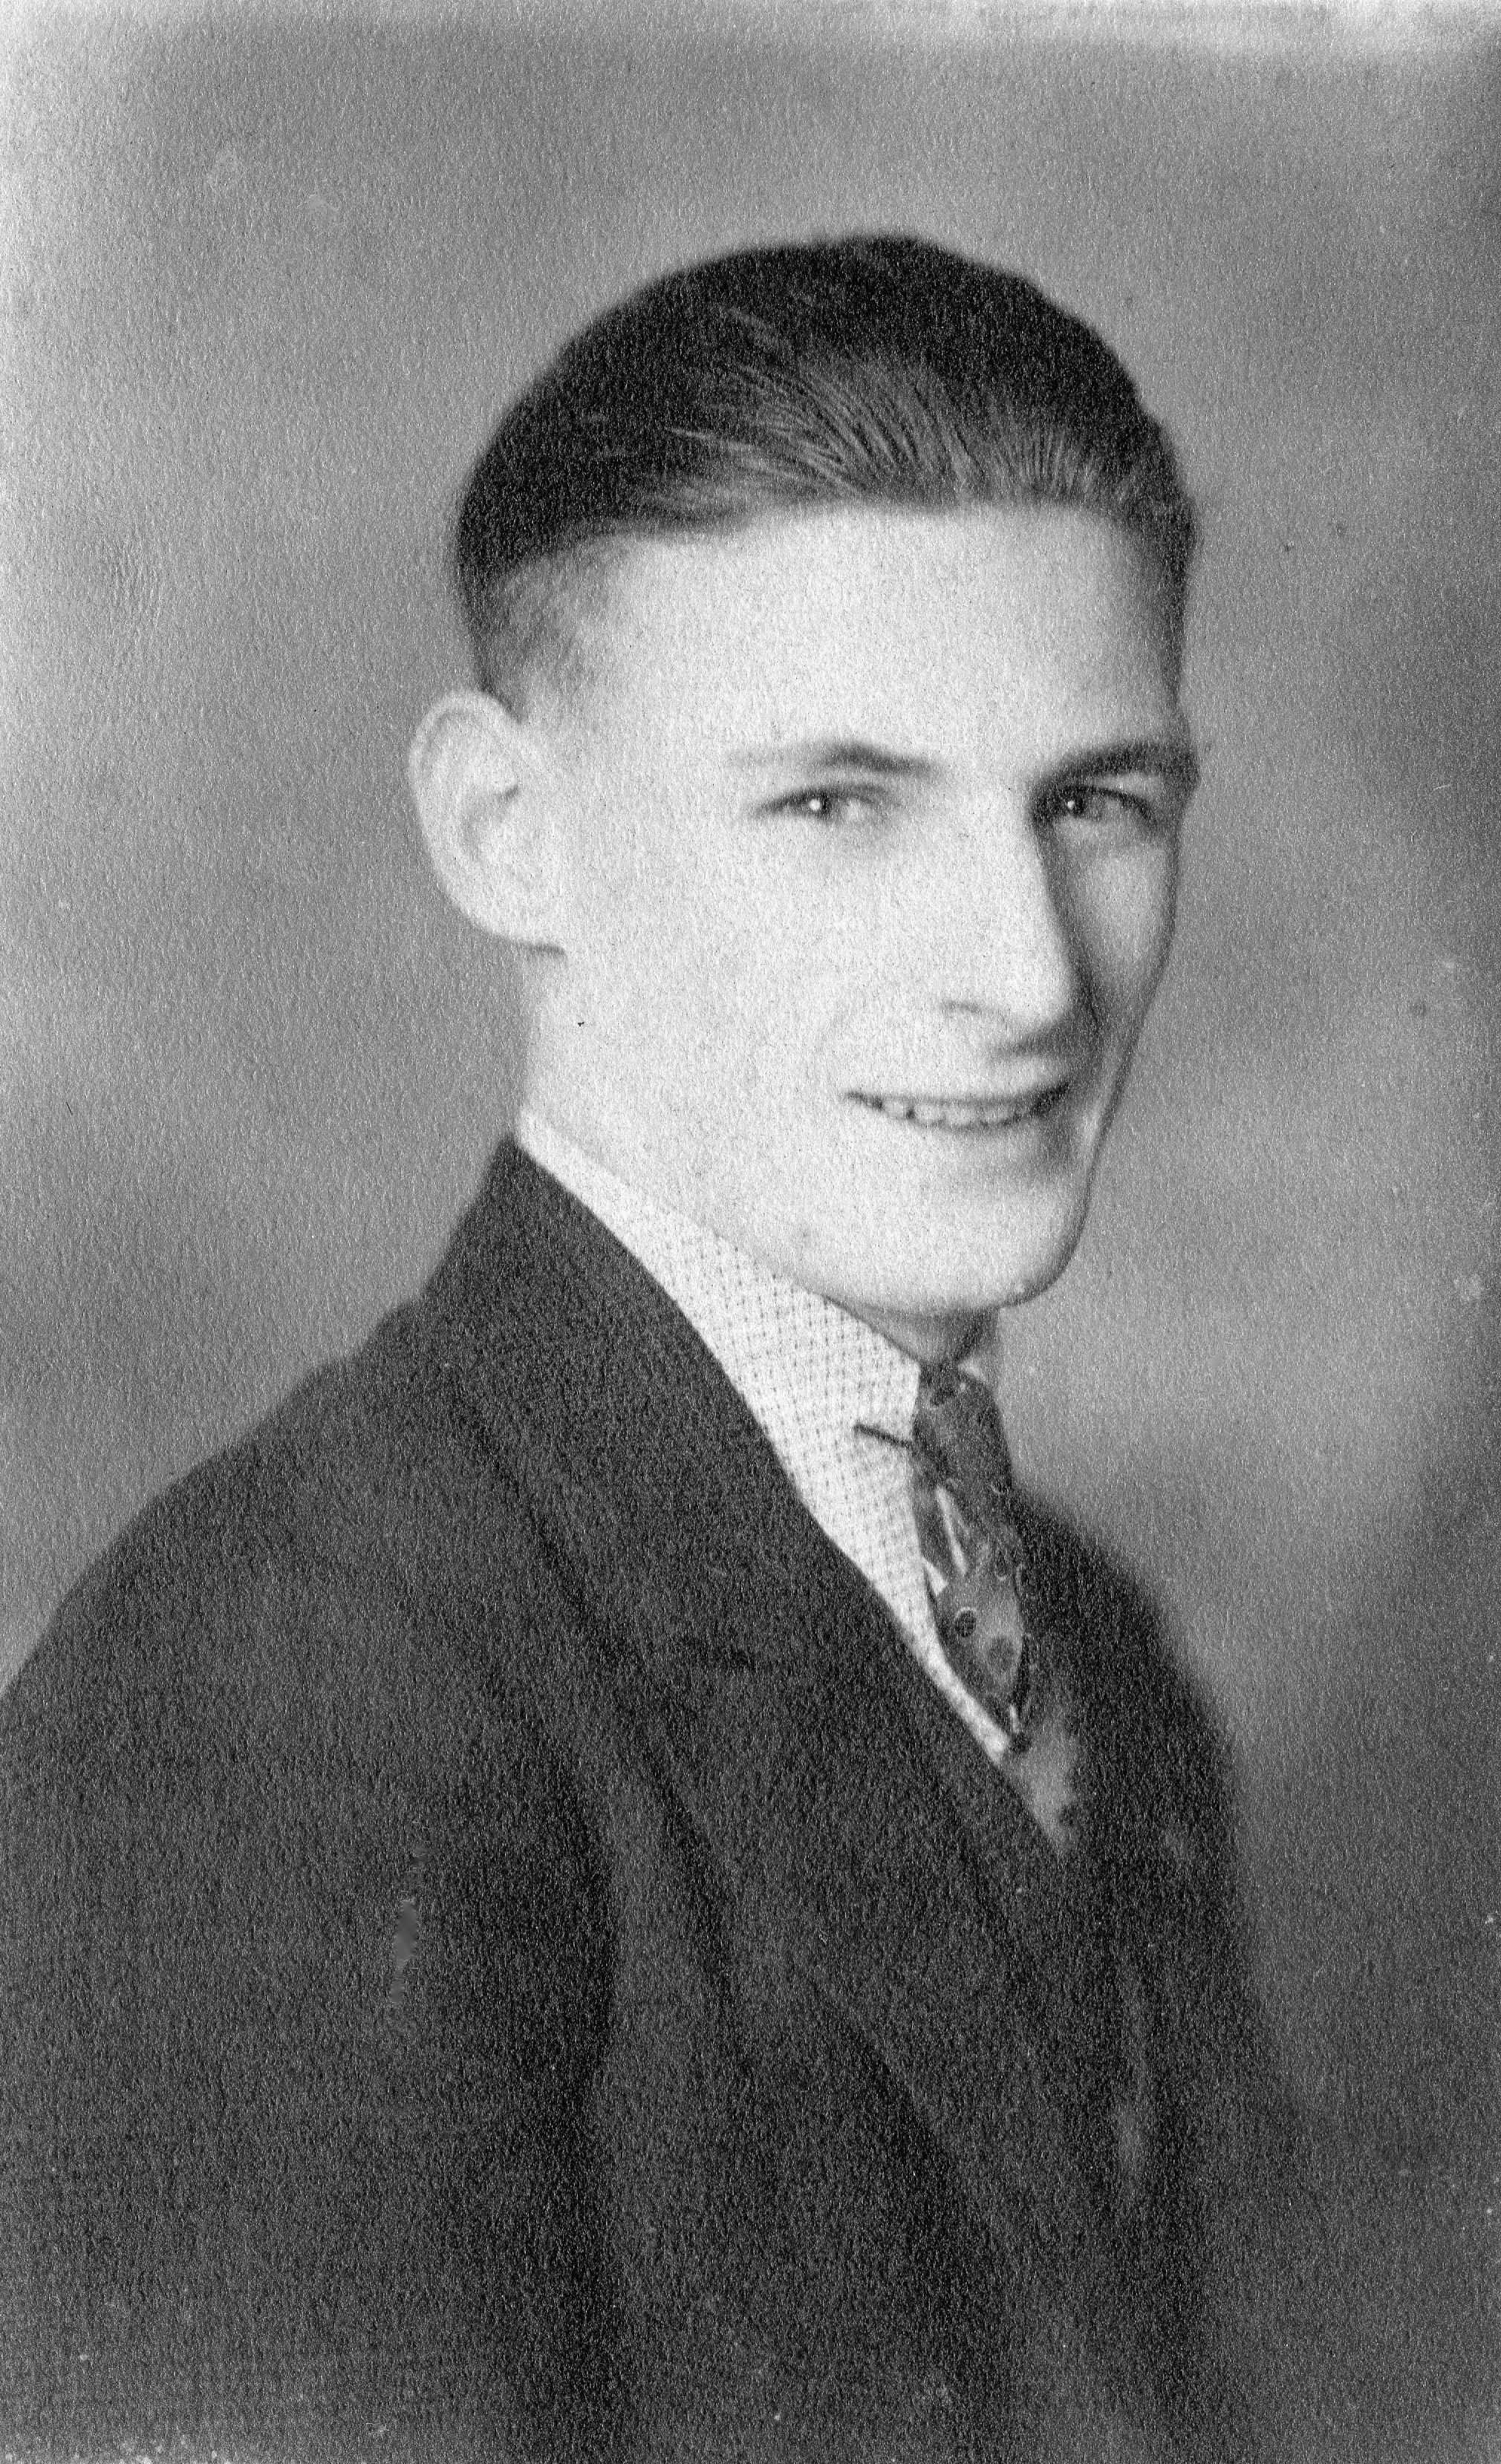 Photo of Edward James Kilcup